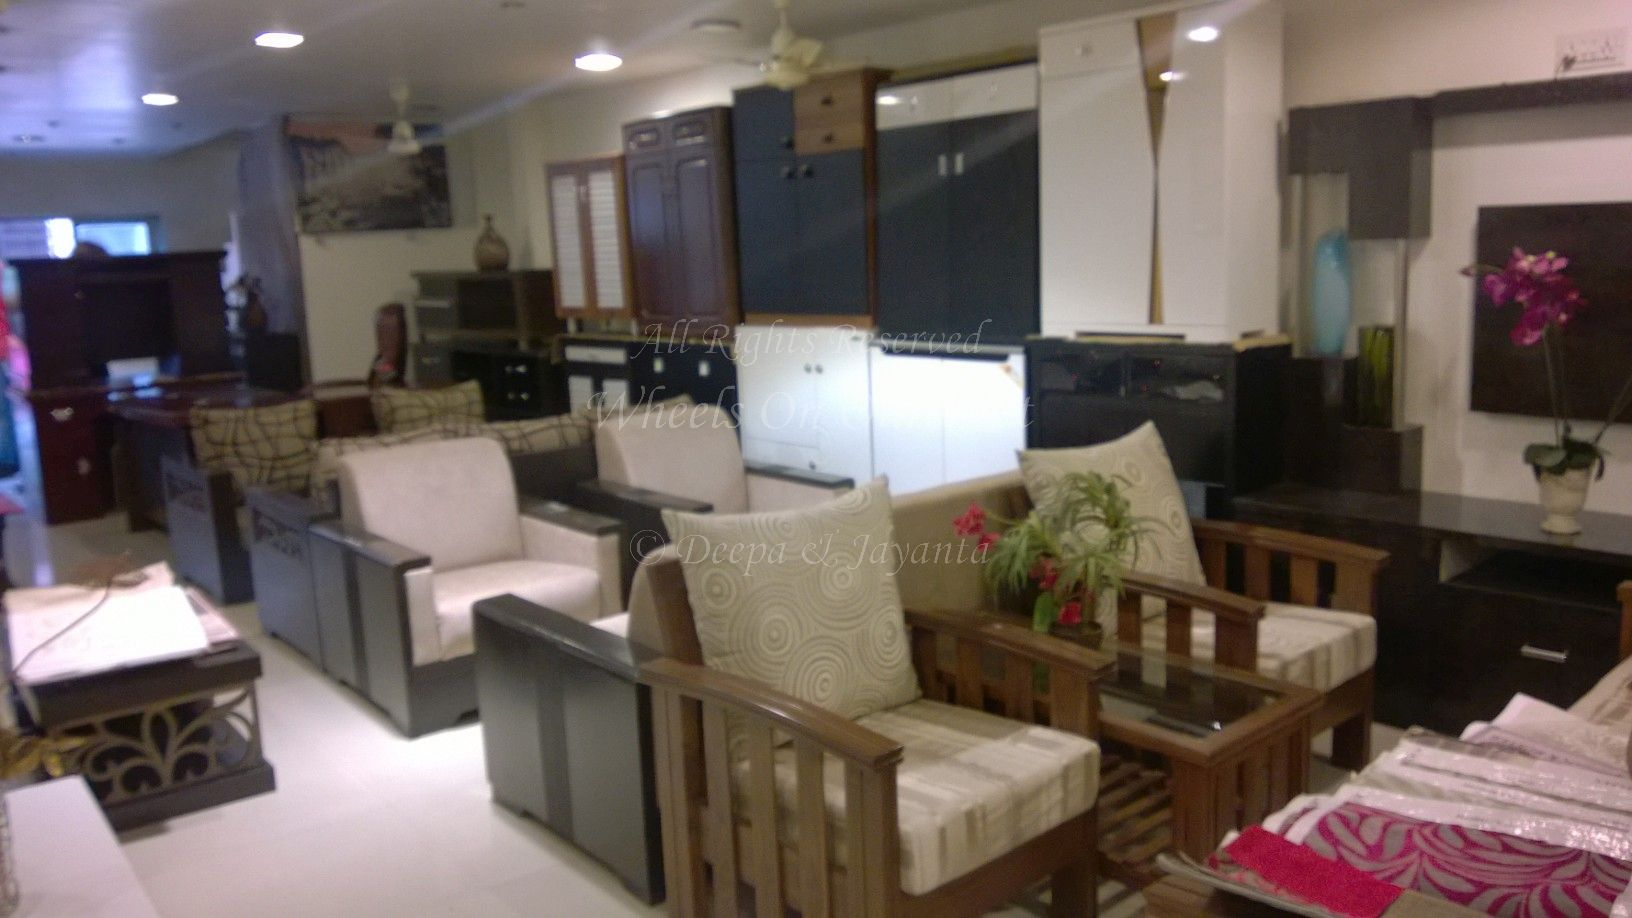 sofa set showroom in mumbai reupholster leather uk bangur nagar goregaon west  best furniture shops